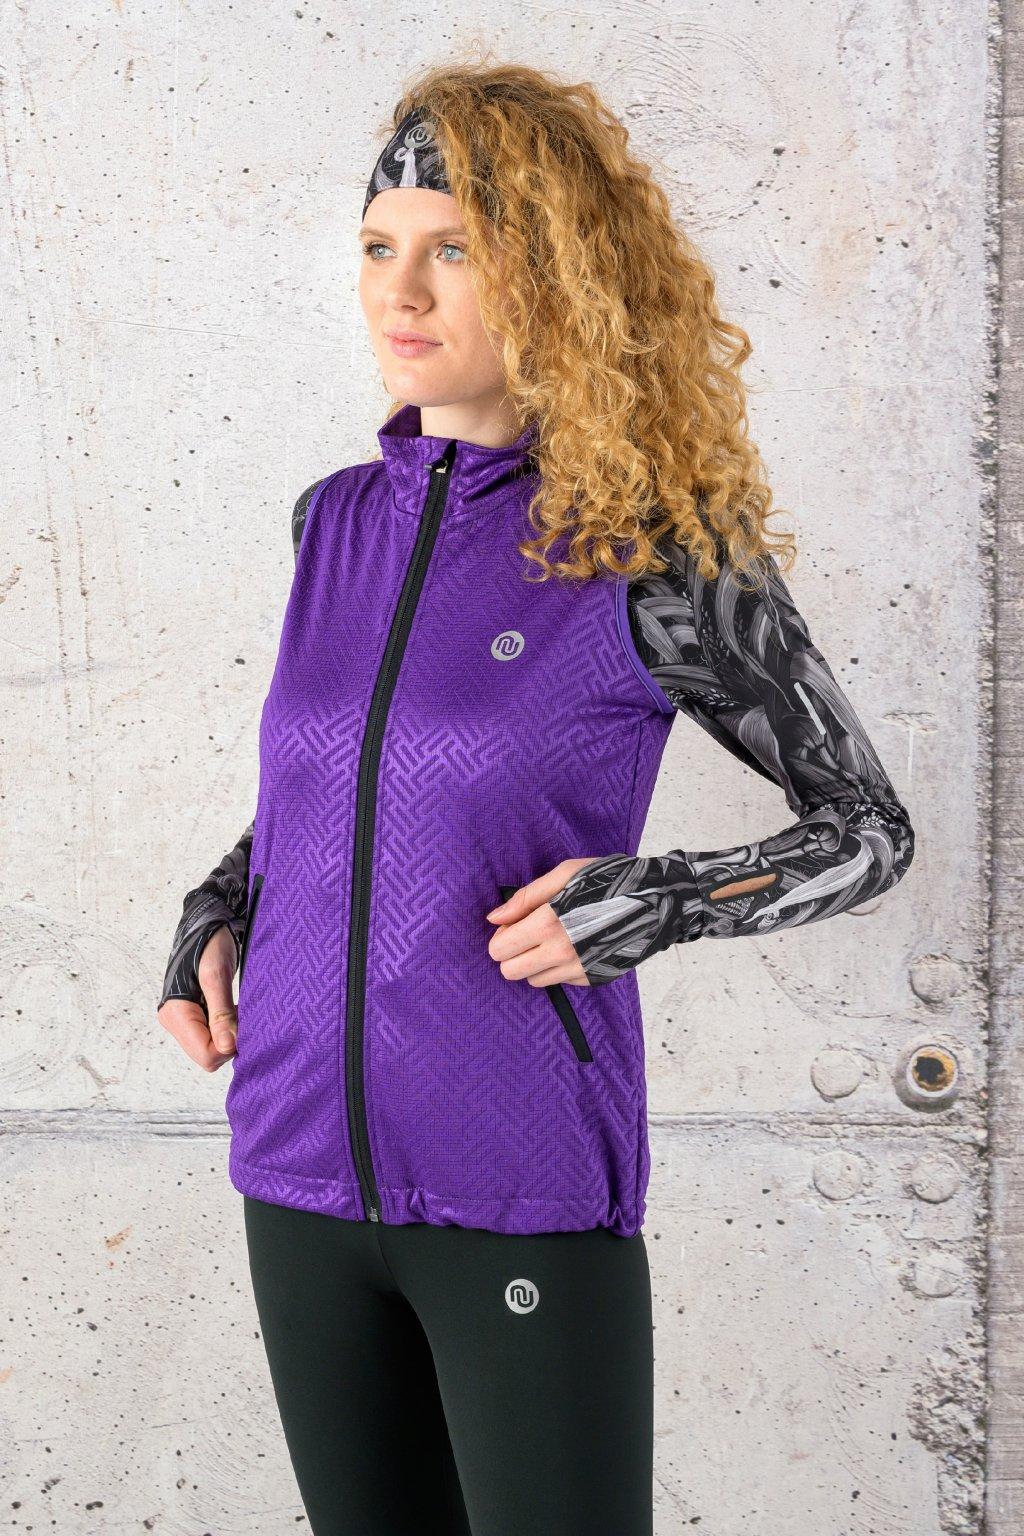 Vesta shiny 2 purple hbd 1260t 1